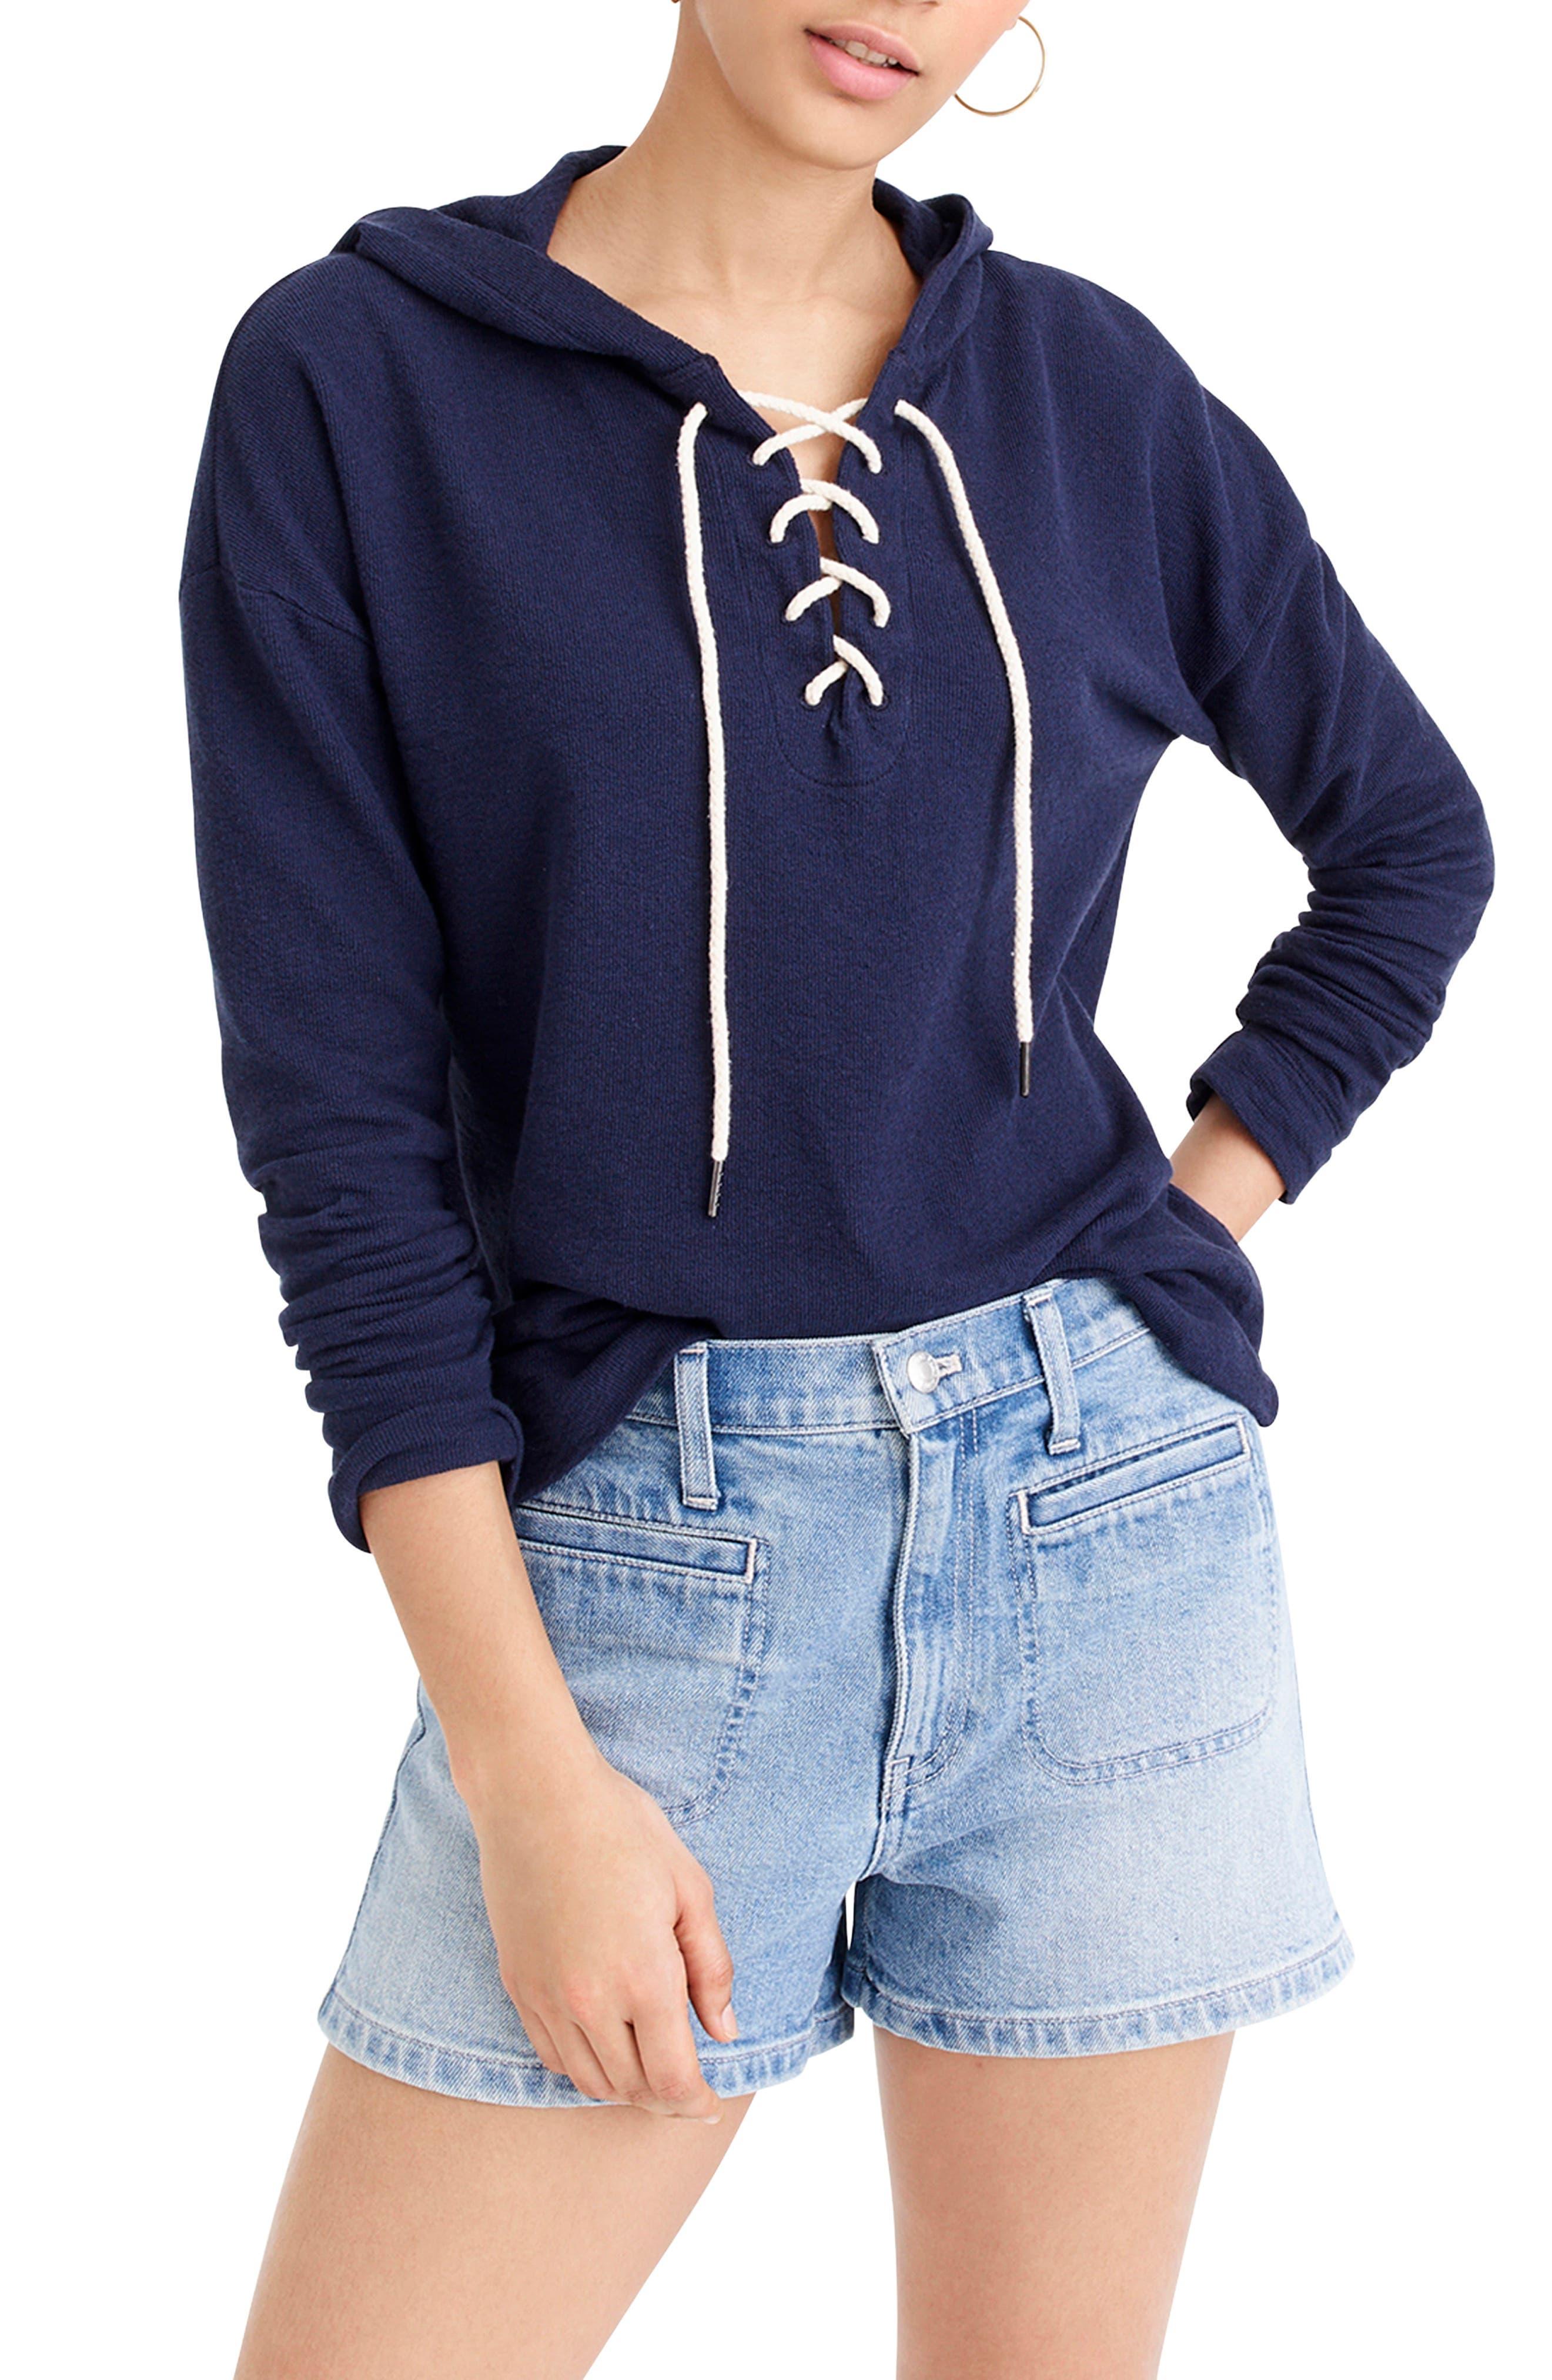 Plus Size J.crew Lace-Up Swing Hoodie Pullover Sweatshirt, Size - Blue